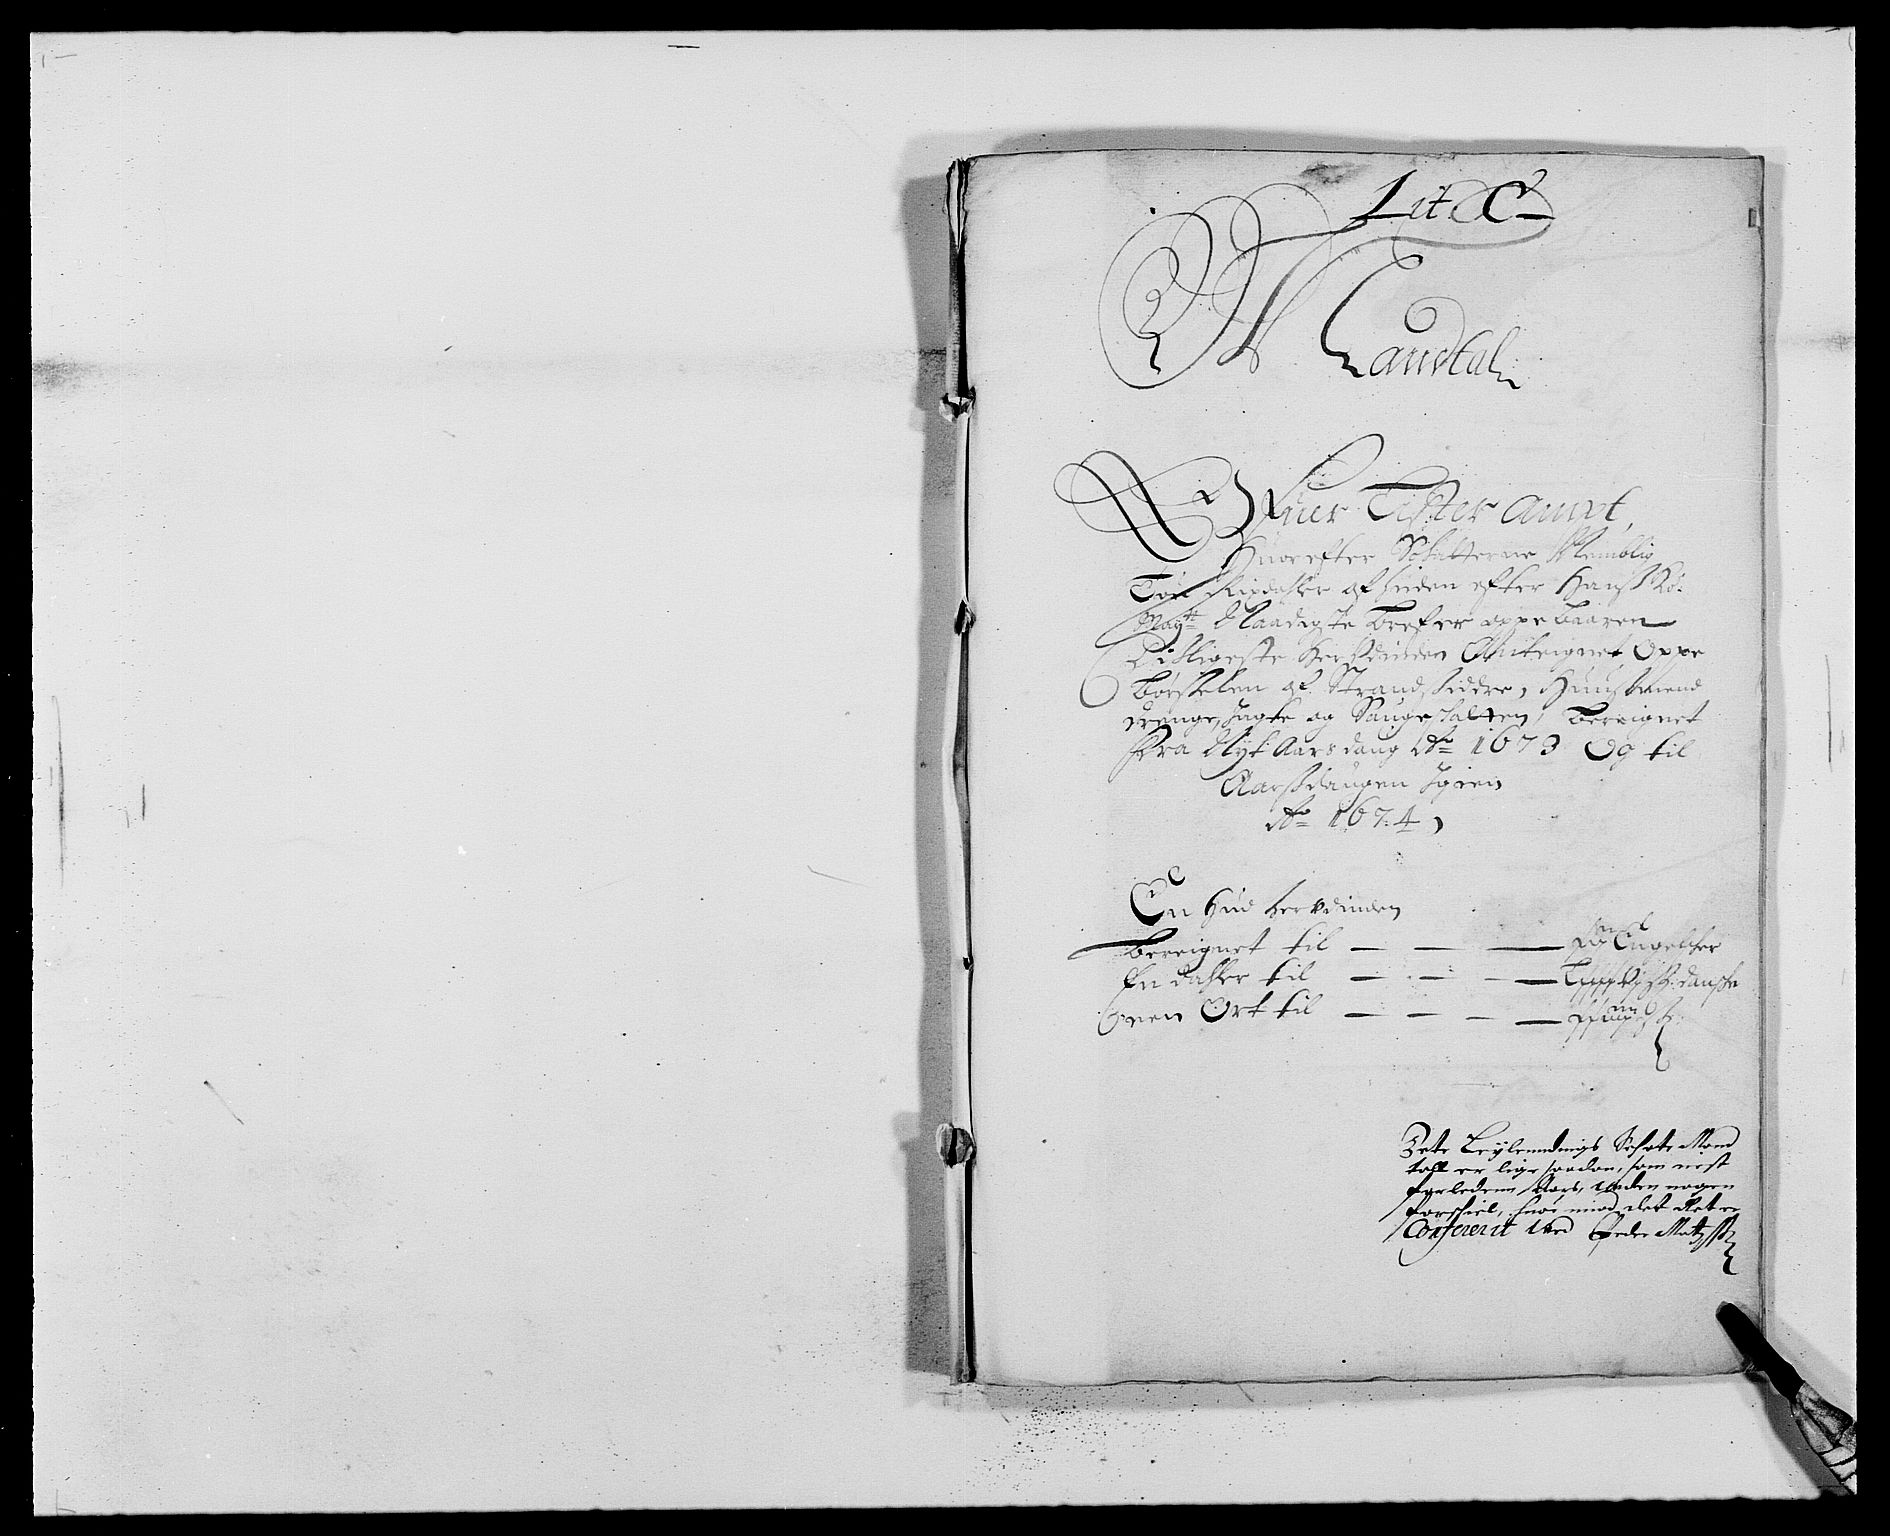 RA, Rentekammeret inntil 1814, Reviderte regnskaper, Fogderegnskap, R41/L2528: Fogderegnskap Lista, 1673-1674, s. 101